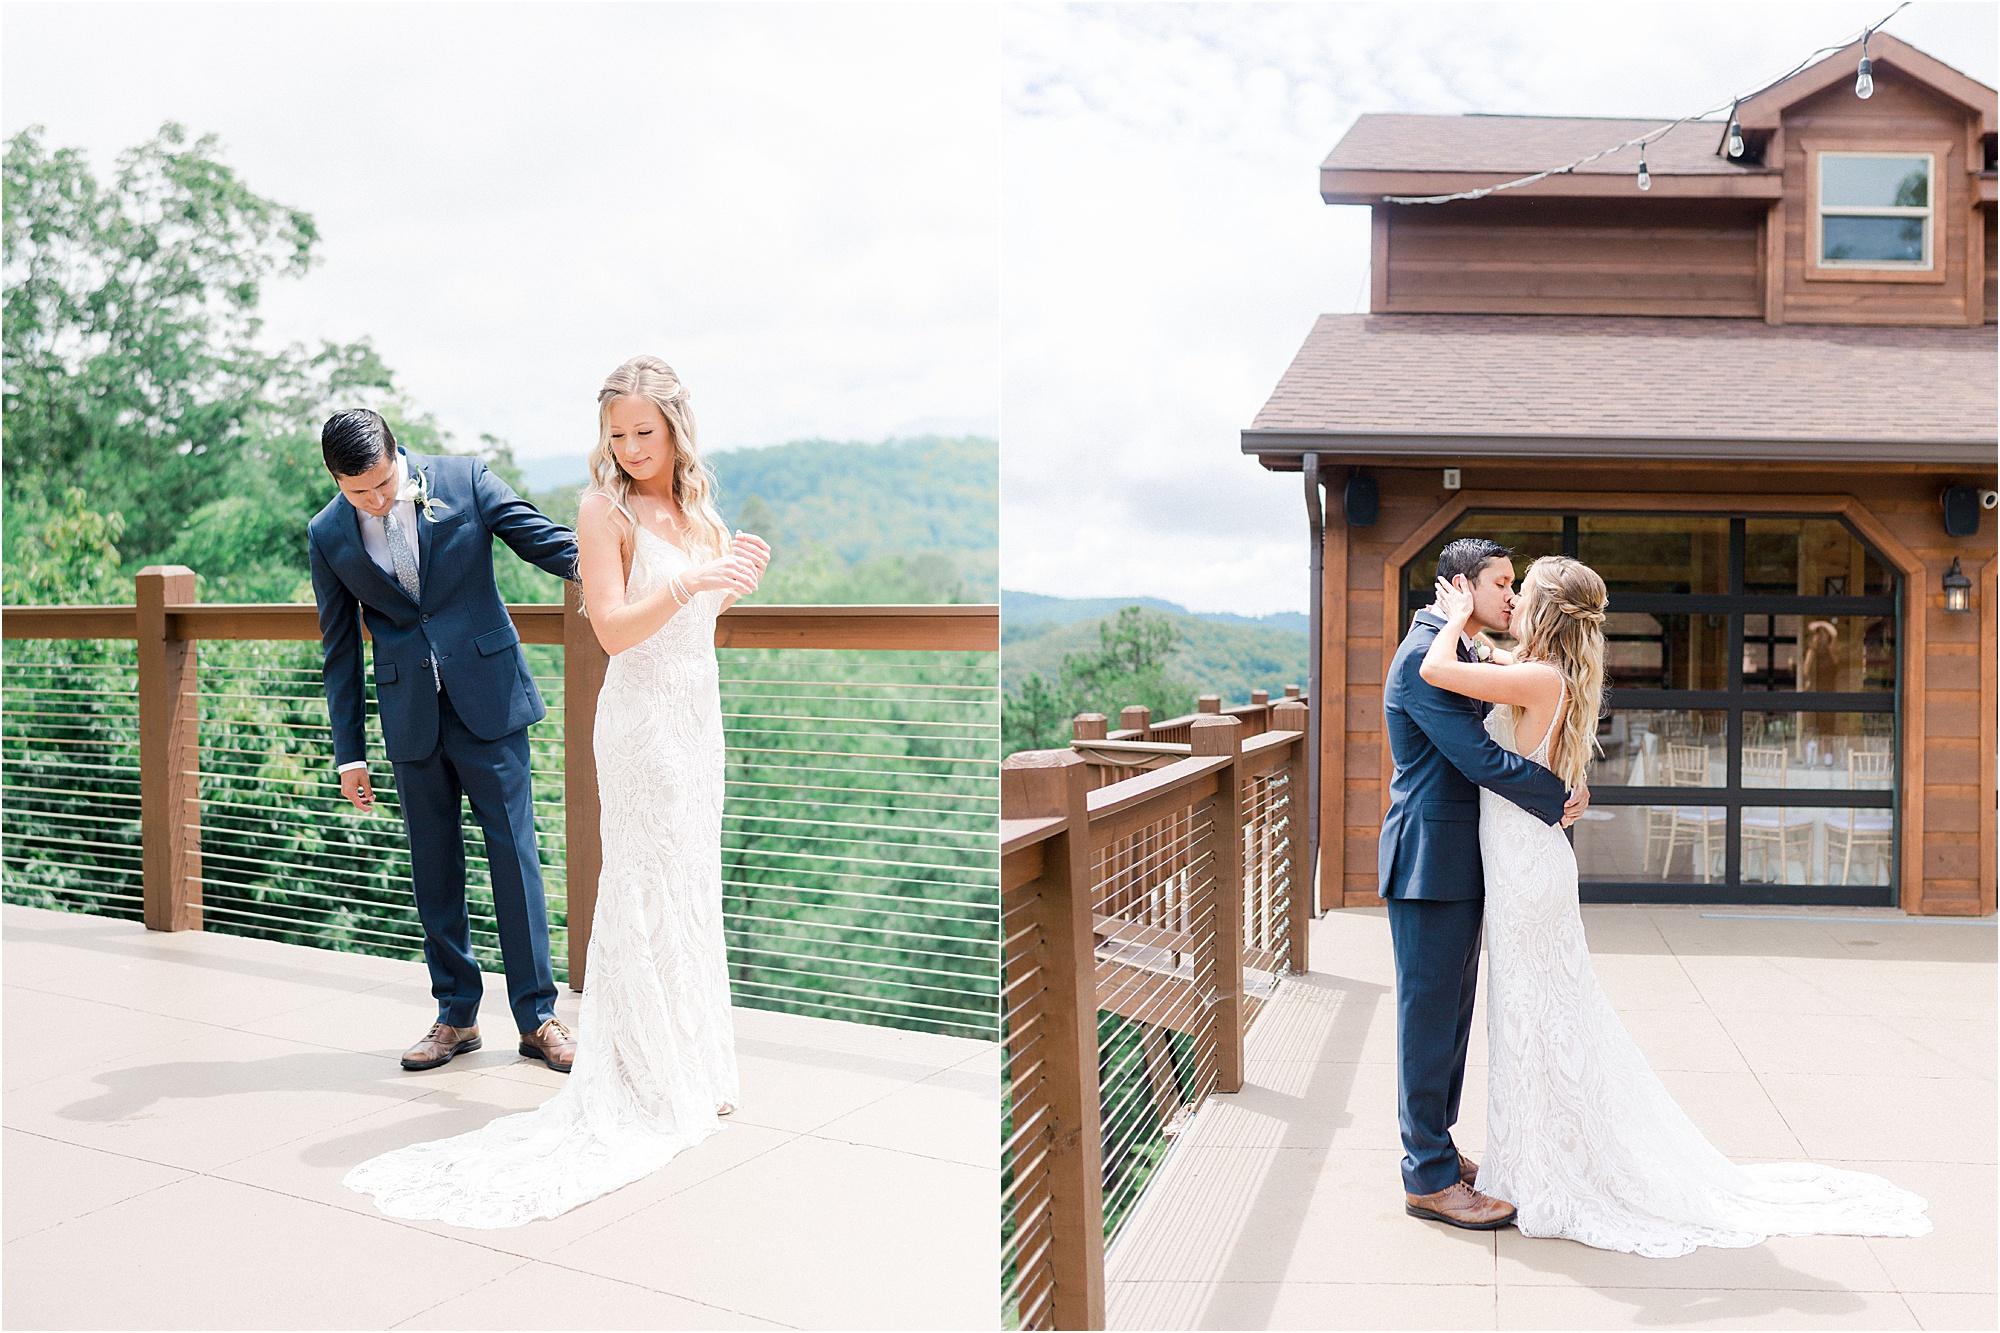 groom and bride kissing at railing at mountain wedding cabin